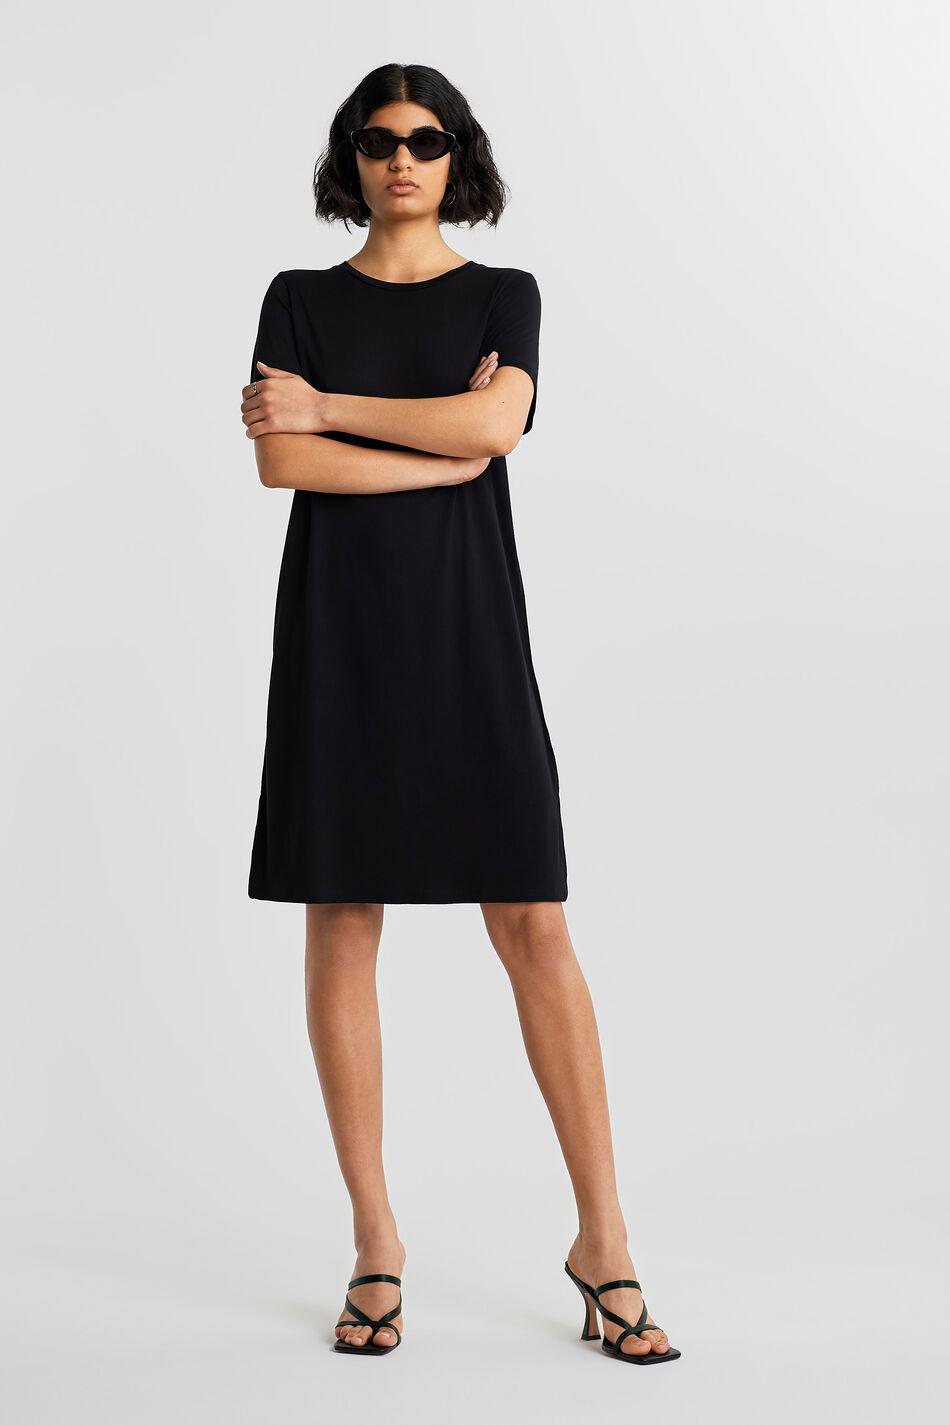 Gina Tricot Lilja PETITE t-shirt dress